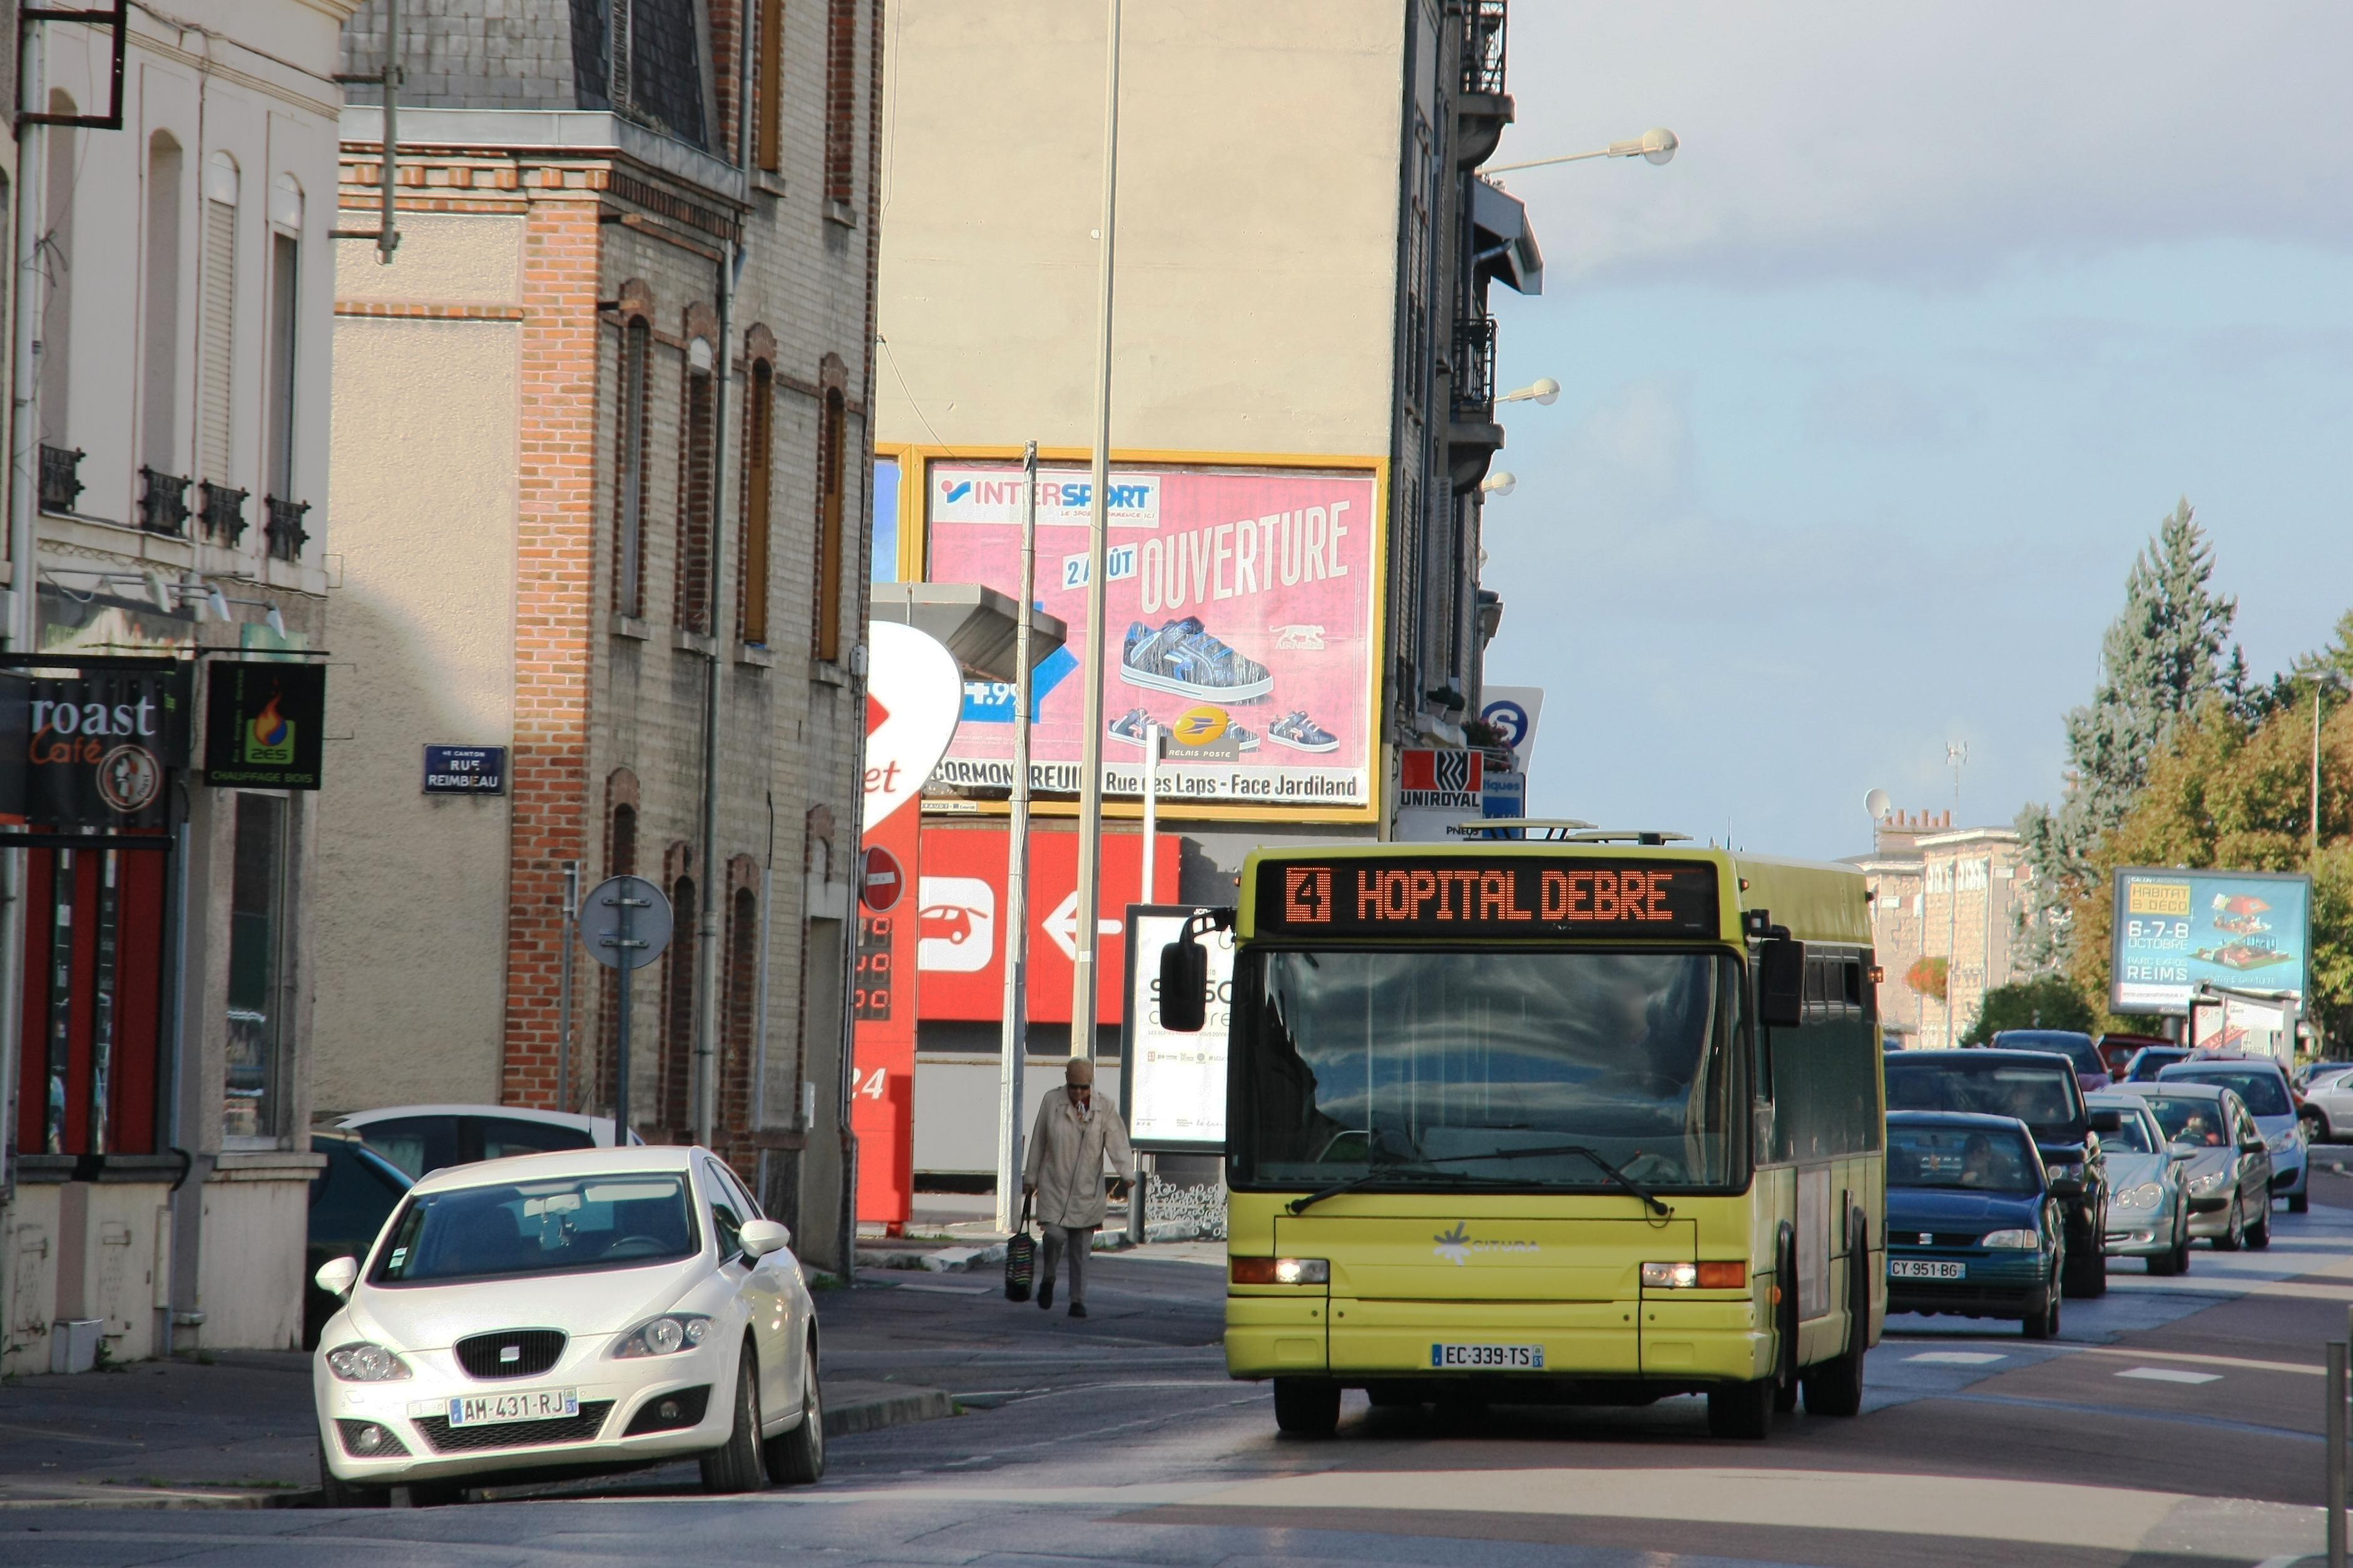 CITURA - Heuliez Bus GX317 n°258 - Ligne 4, Building, Car, Road, Sign, HQ Photo